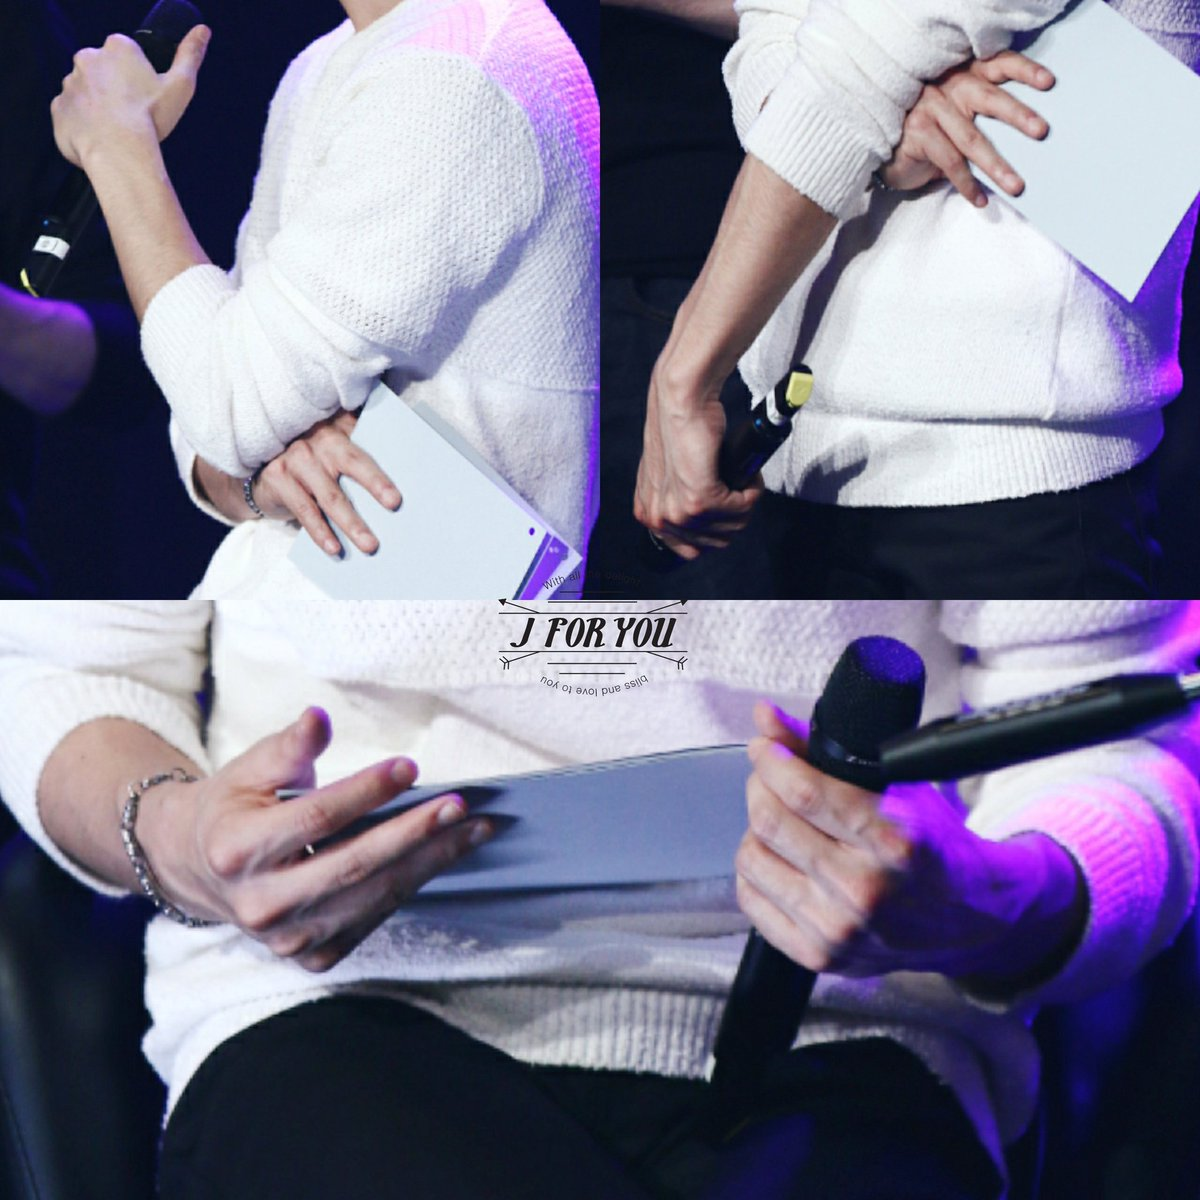 160426 Jonghyun @ MBC Live Concert - Blue Night ChA0NtoU8AELbs1